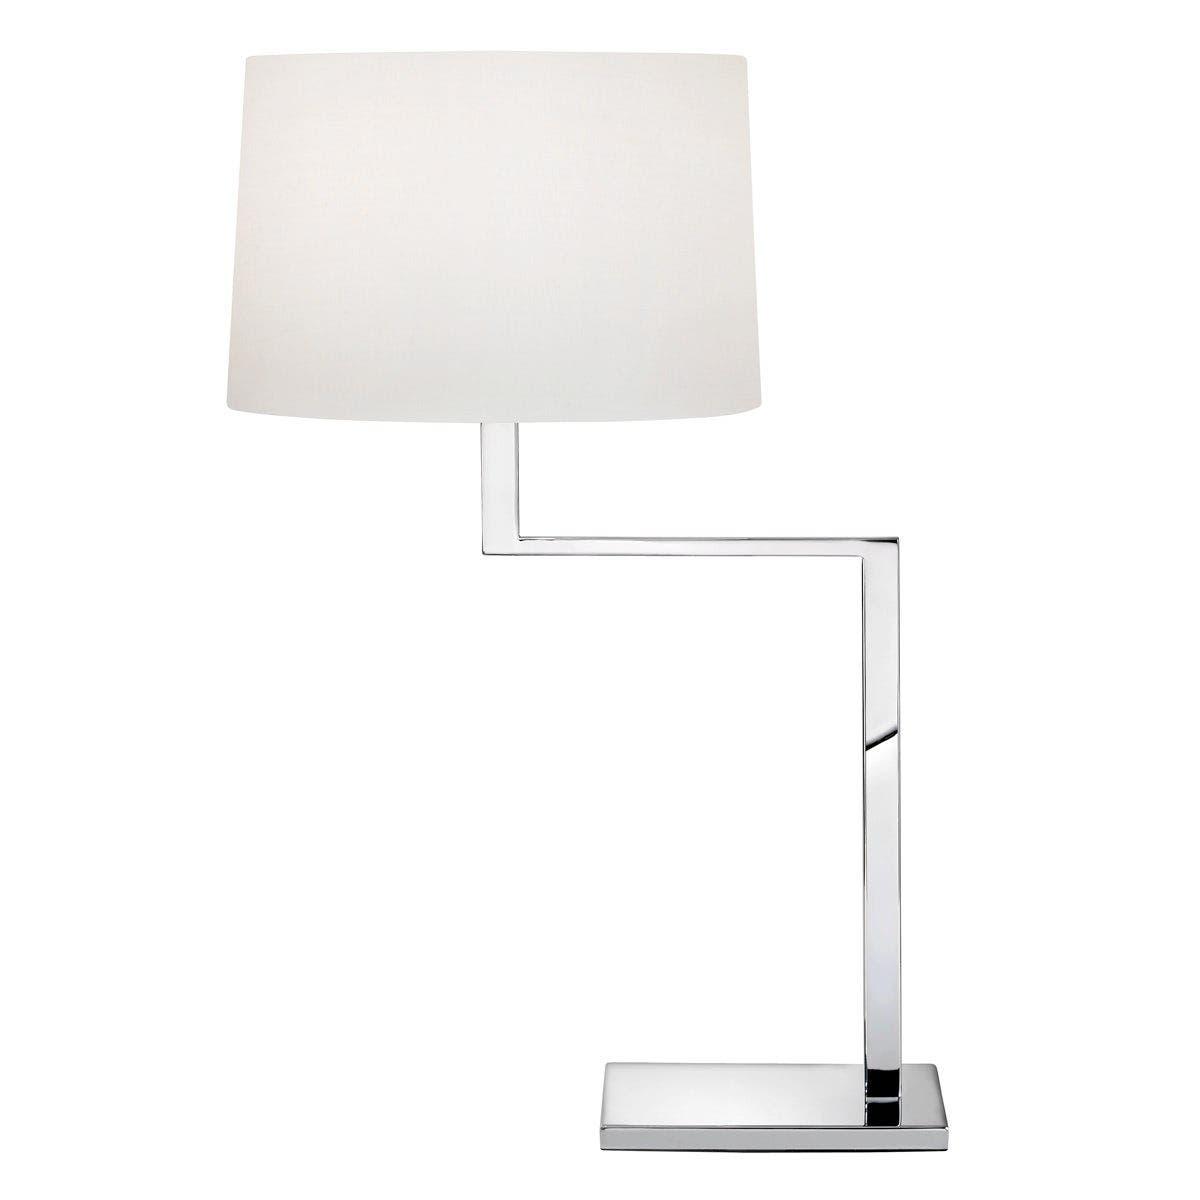 sonneman Thick Thin Table Lamp bedroom